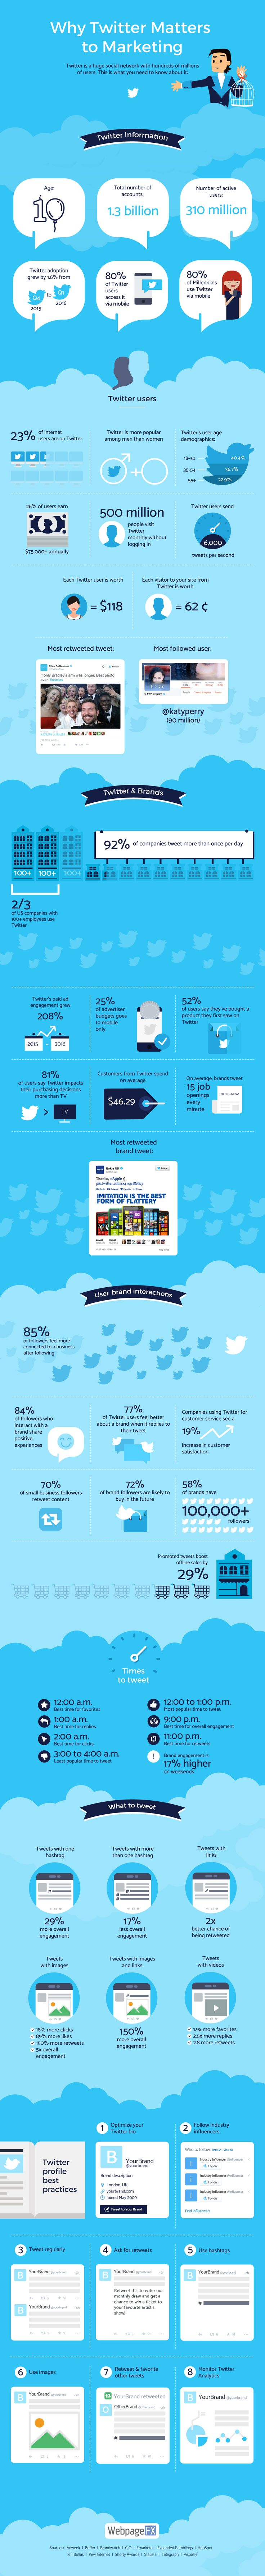 Why Twitter Matters To Marketing: http://blog.hubspot.com/marketing/twitter-stats-tips